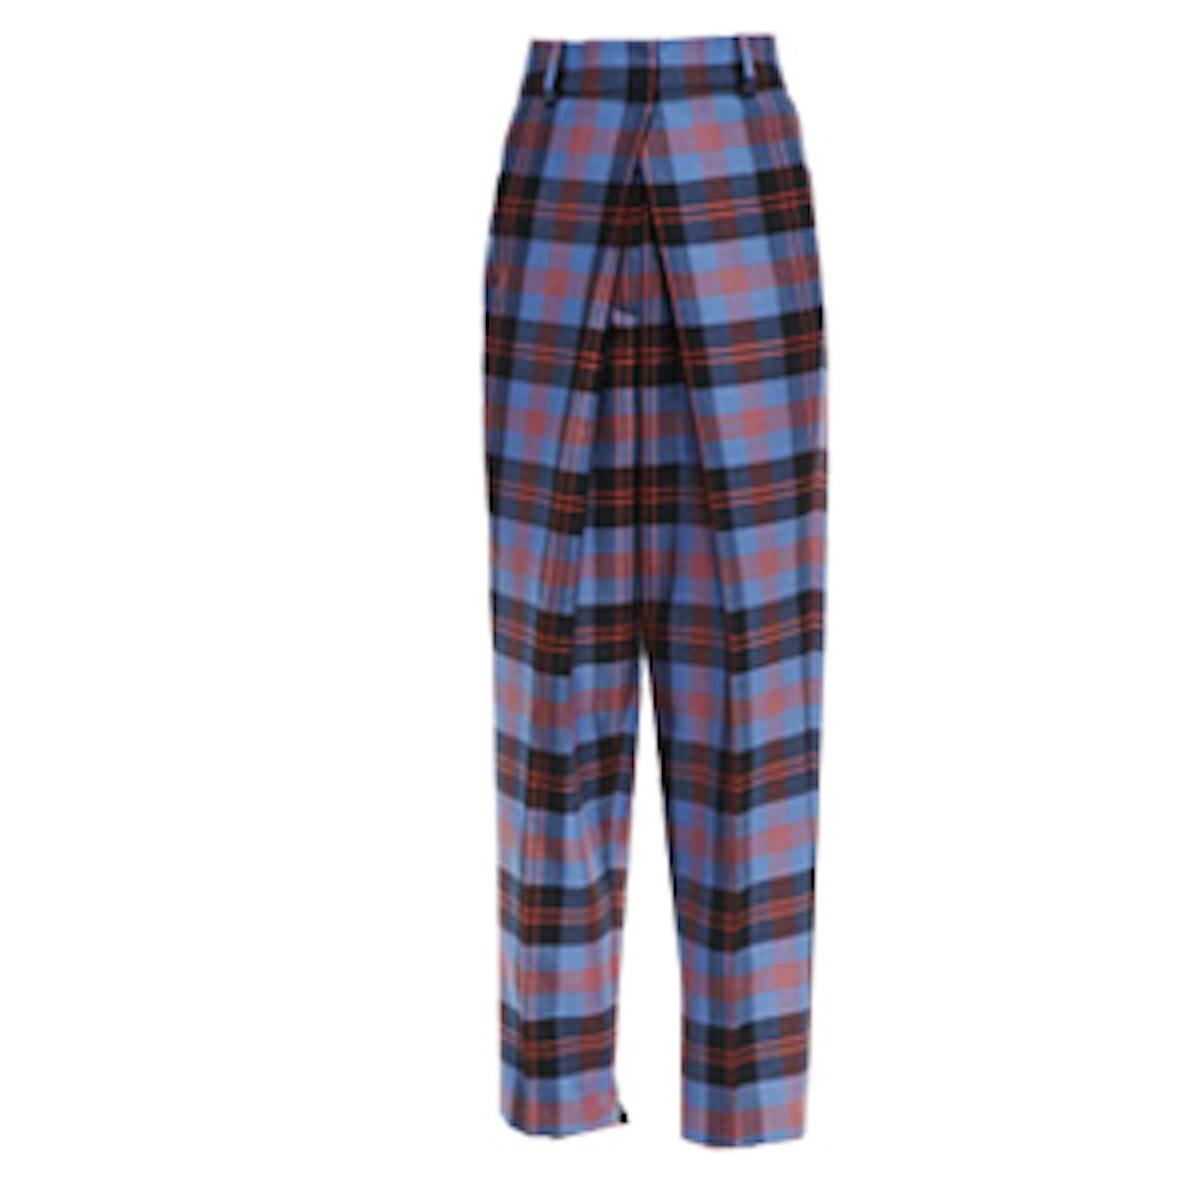 Plaid Trousers